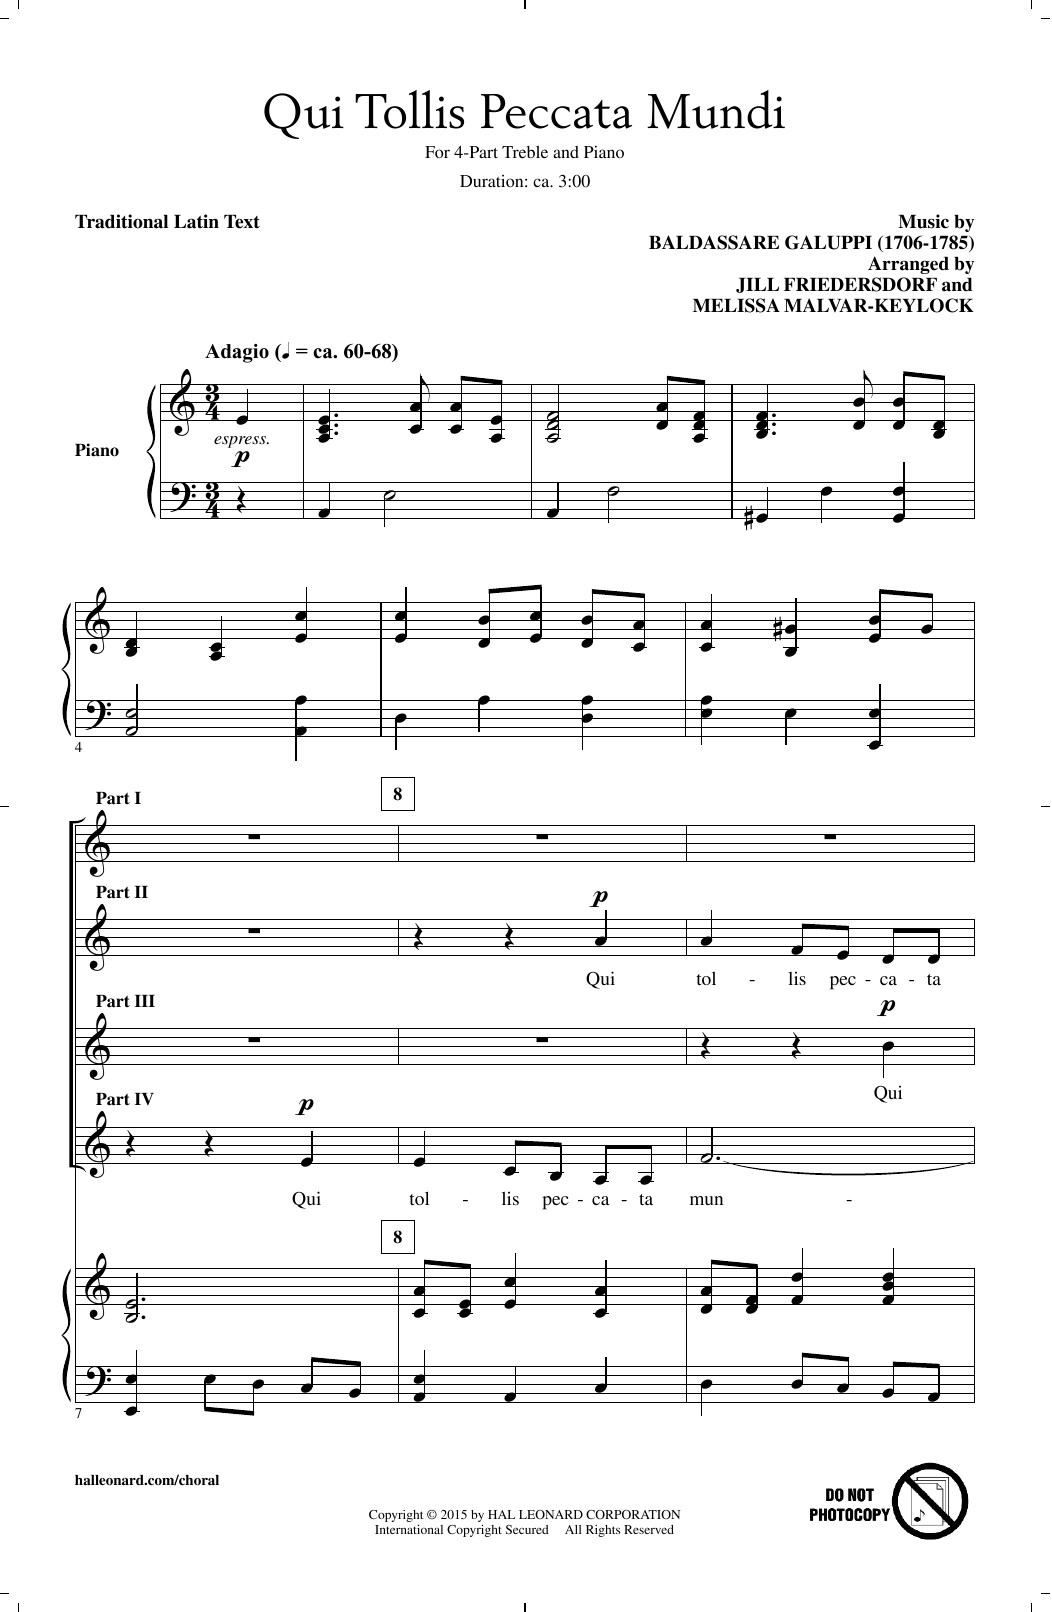 Melissa Malvar-Keylock Qui Tollis Peccata Mundi sheet music notes and chords